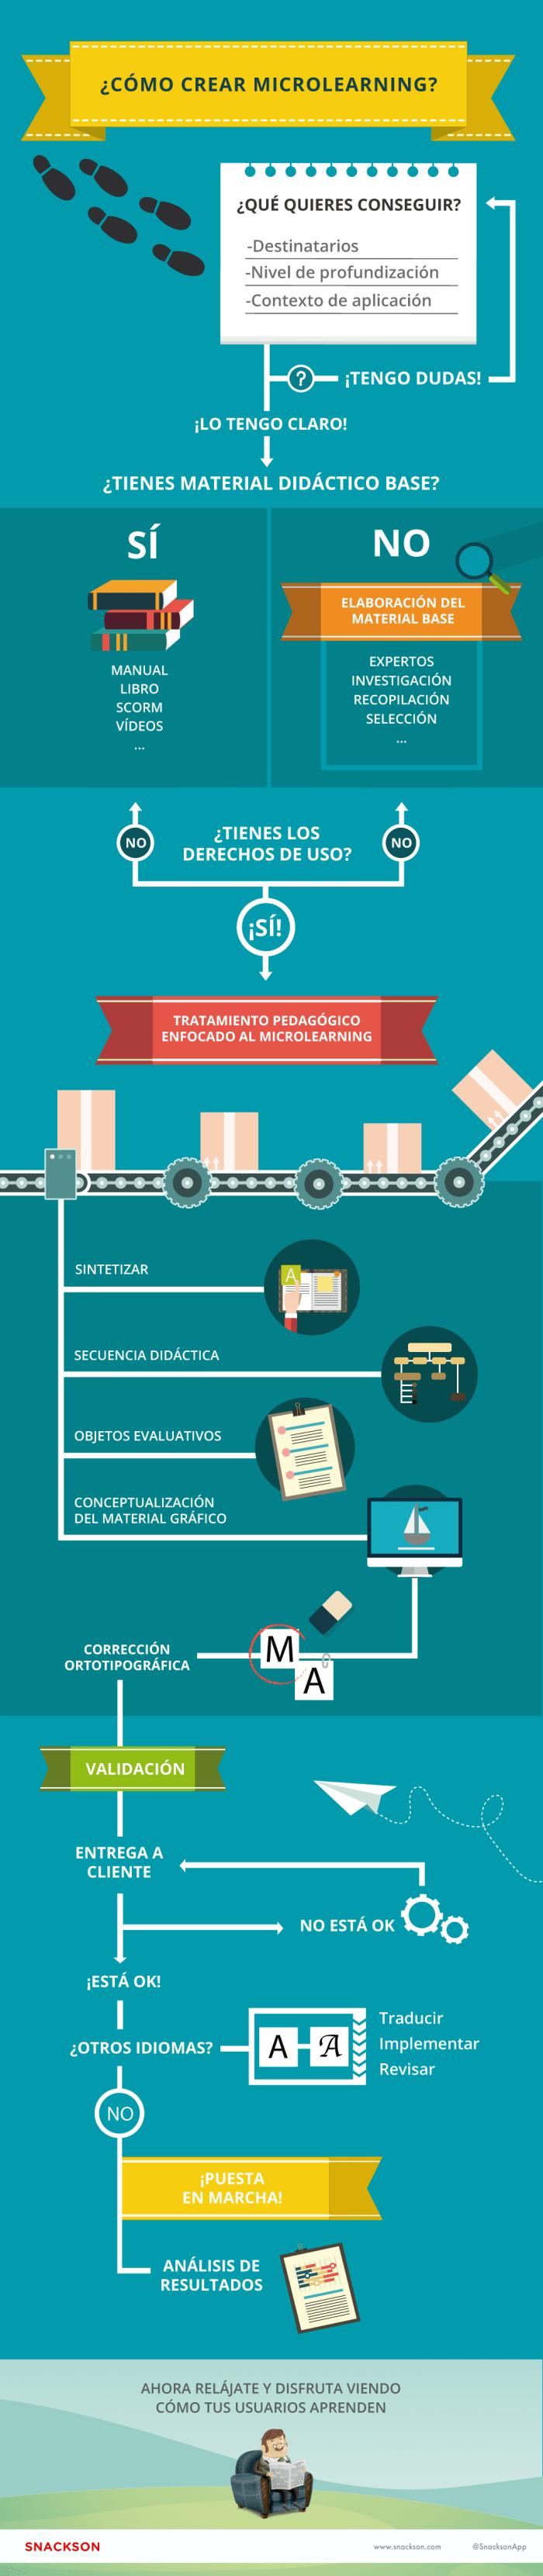 CreandoMicroAprendizajesFlujogramaProceso-Infografía-BlogGesvin